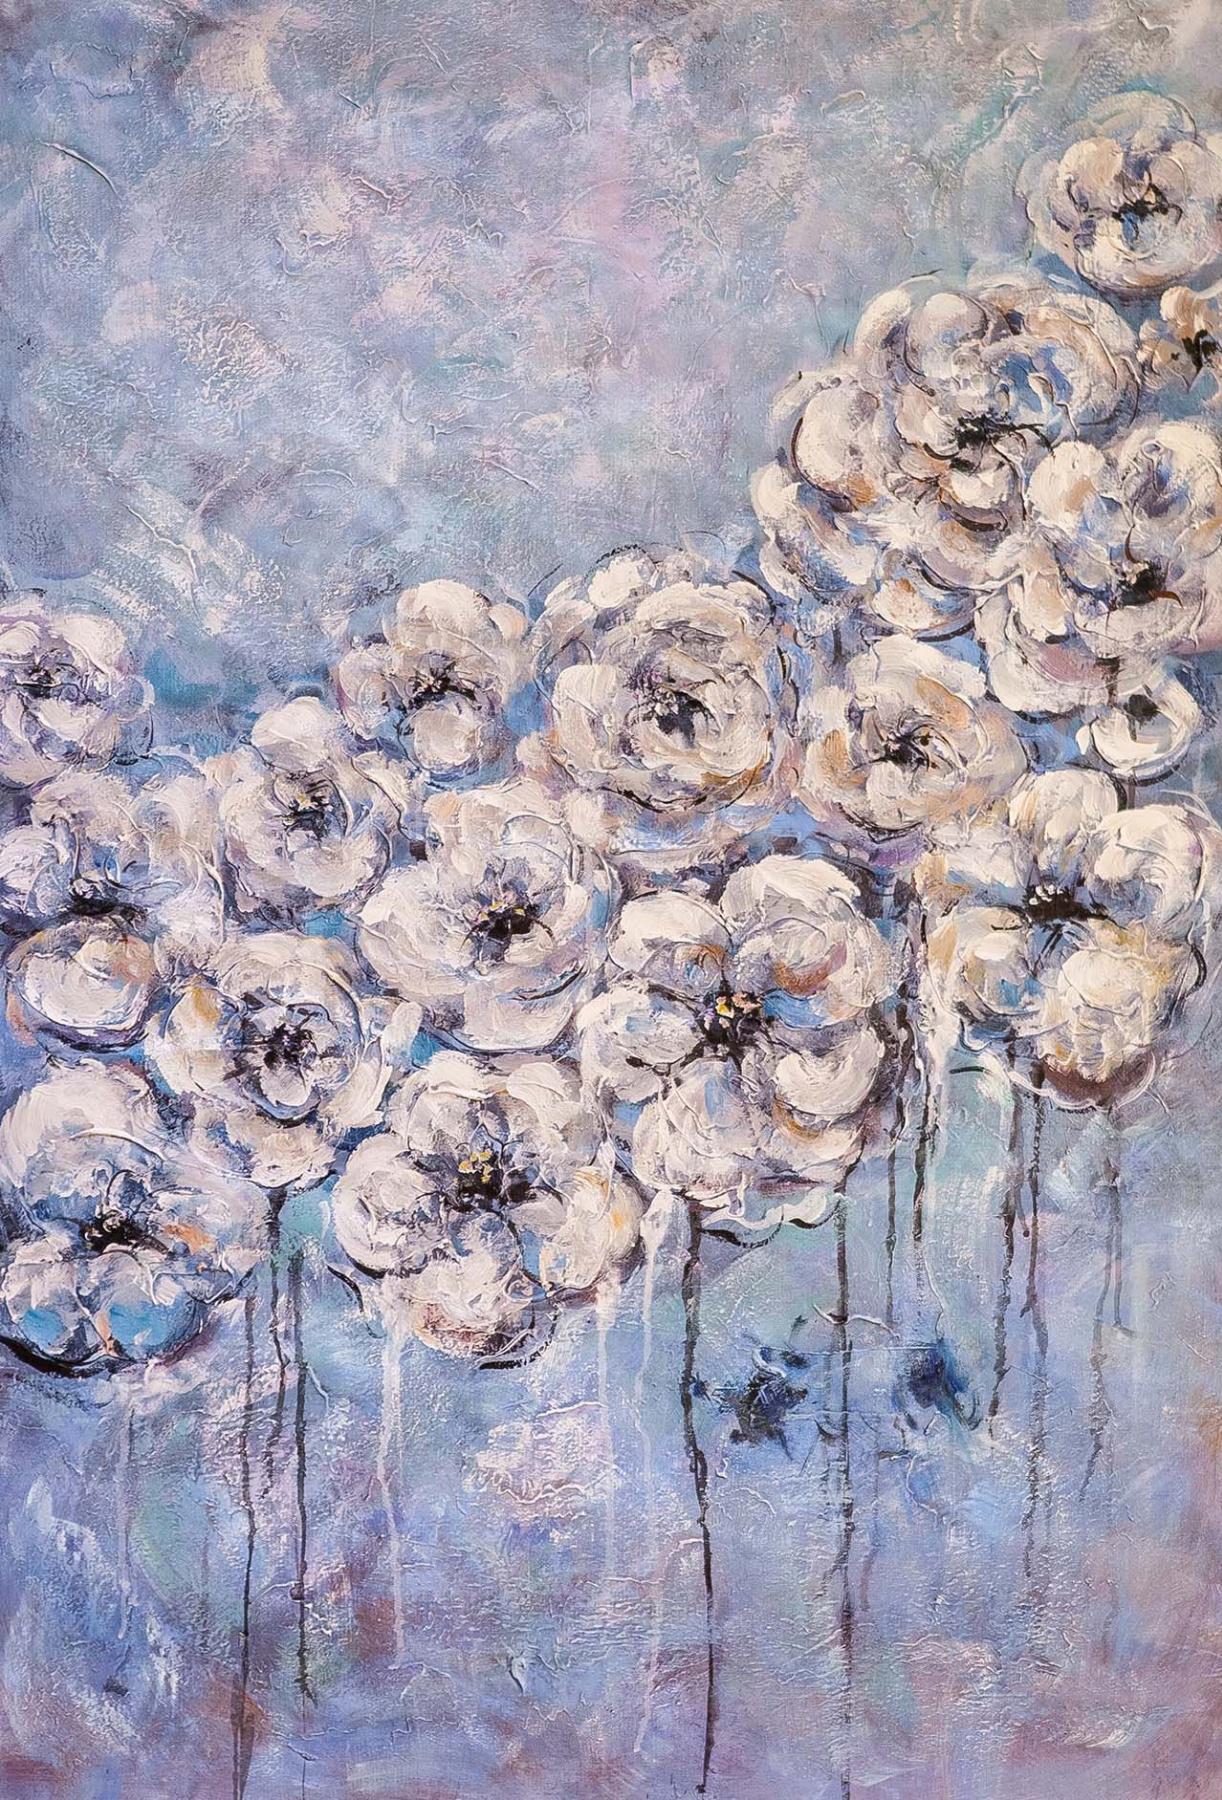 Brian dupre. Floral fleece N2